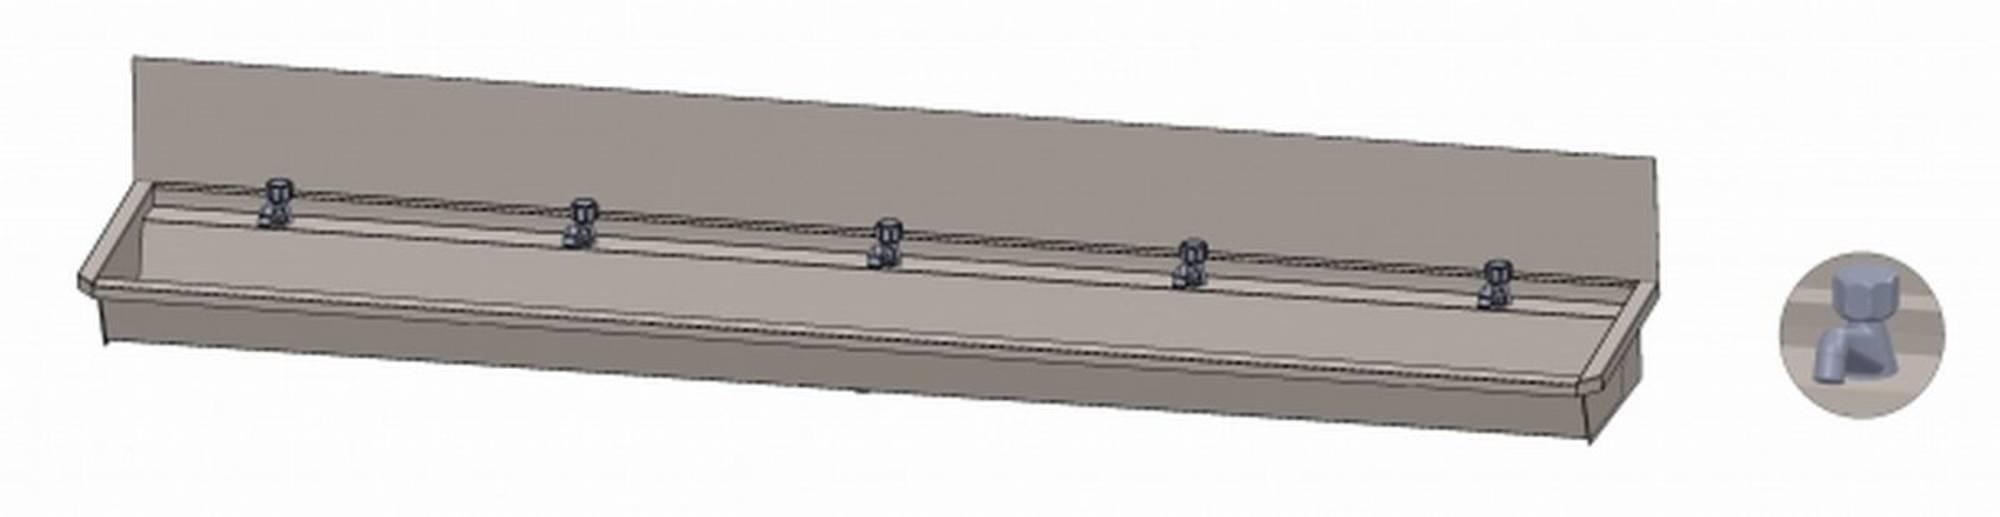 INTERSAN SANILAV wasgoot met spatbord 300 cm. met 5 kranen INOX 304 (305L1)